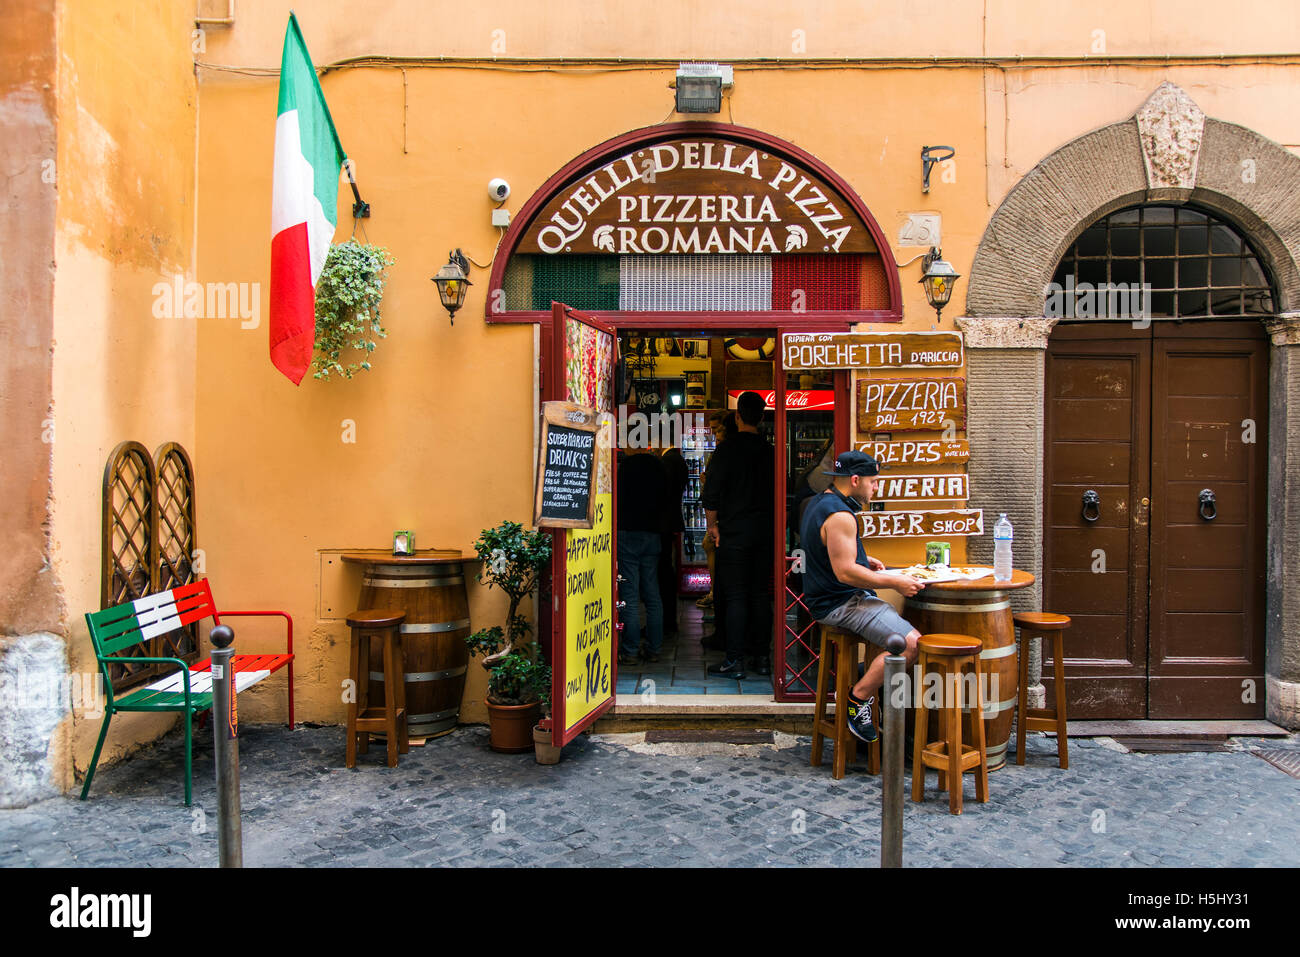 Pizzeria Restaurant mit italienischer Flagge, Rom, Latium, Italien Stockbild